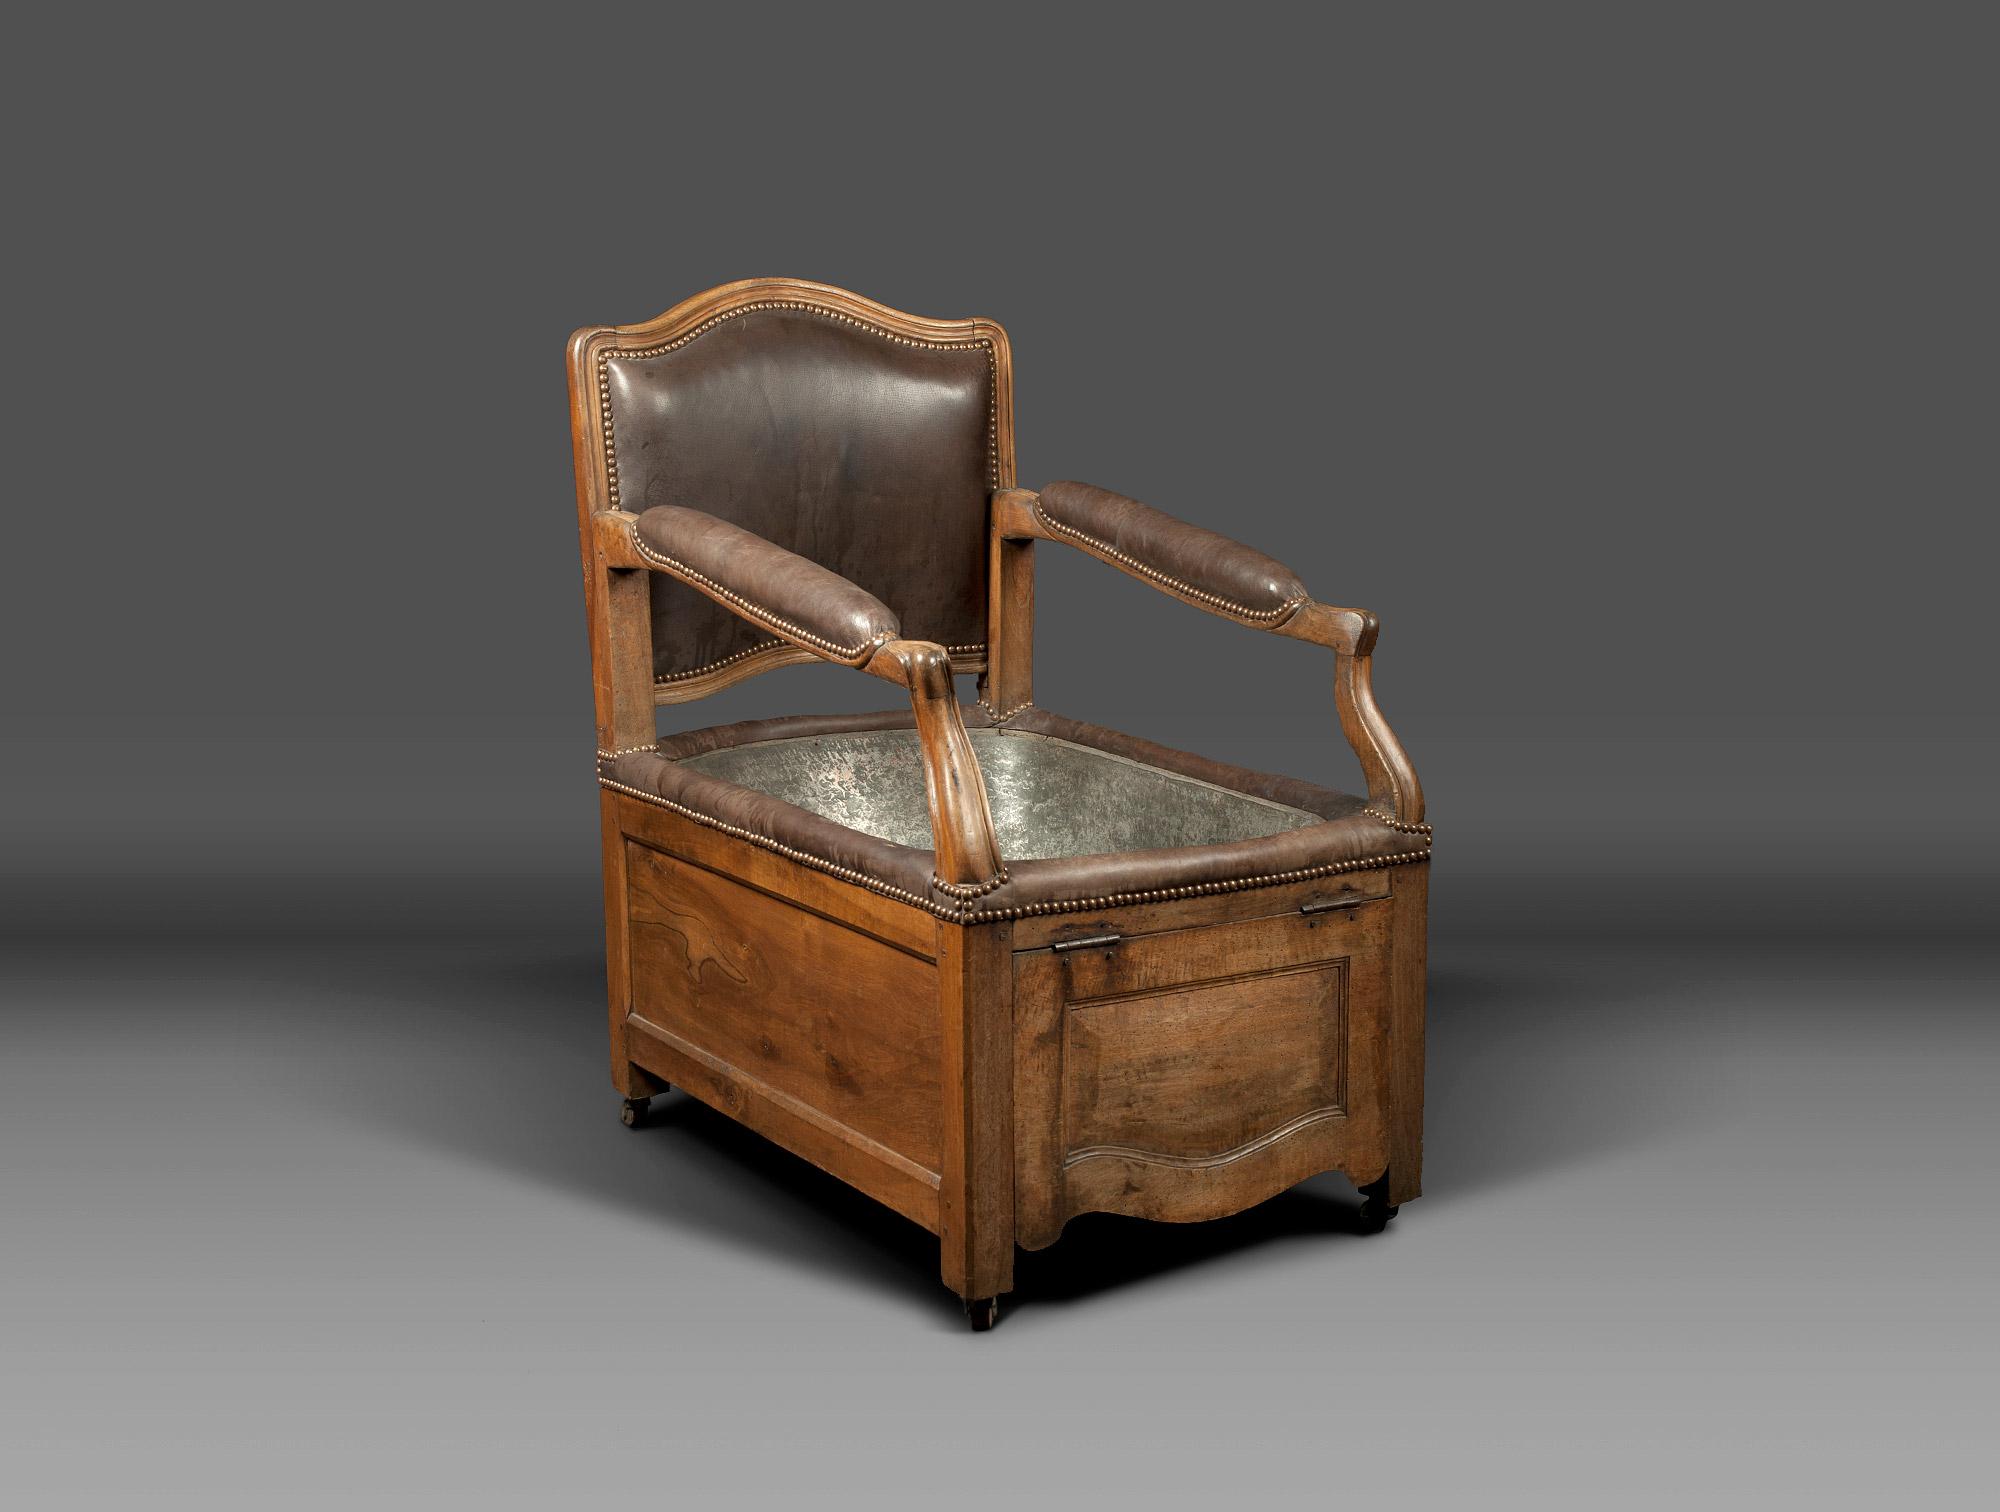 Louis XV chair bathtub Soubrier - Rent Seats Armchair XVIIIth